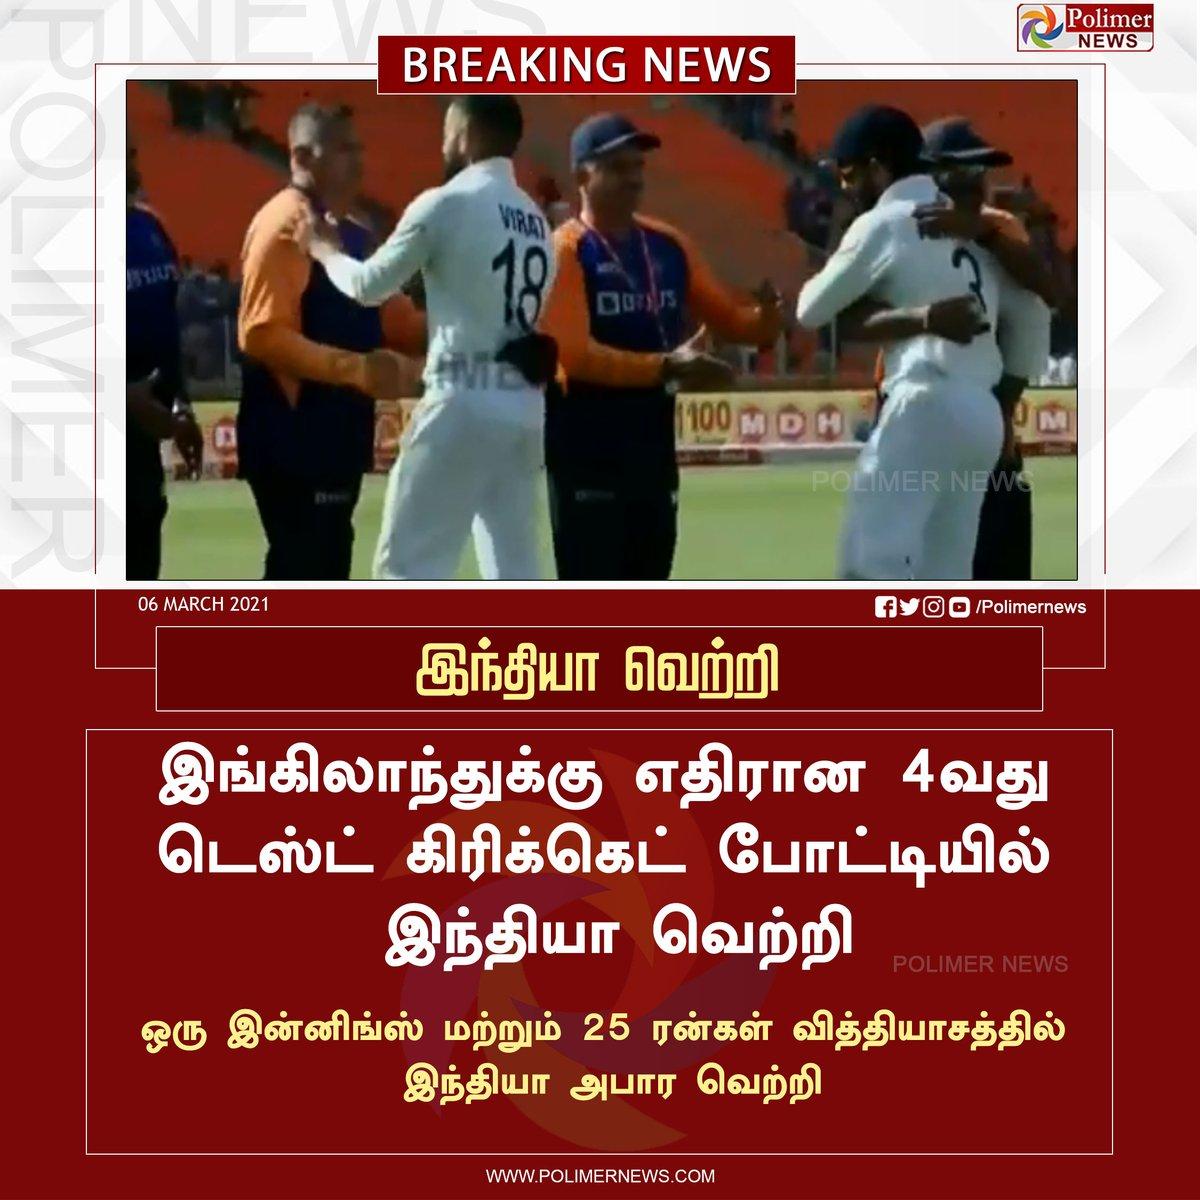 #BREAKING || இங்கிலாந்துக்கு எதிரான 4வது டெஸ்ட் கிரிக்கெட் போட்டியில் இந்தியா வெற்றி #INDvsENG | #ENGvIND | #TestCricket | #TeamIndia | https://t.co/aK7PLSHOjY https://t.co/XKMSKtv1WO